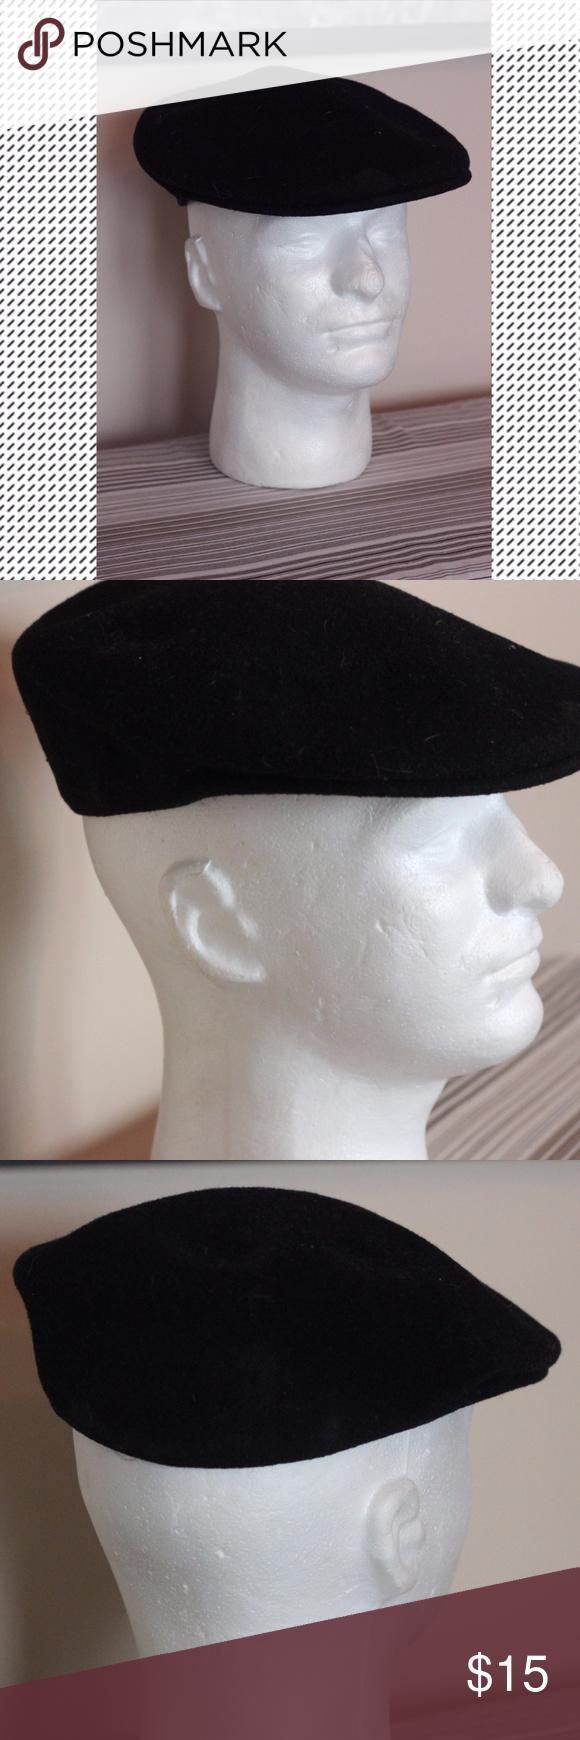 d88e5b1915cab2 Vintage 504 Kangol Hat/Cap in Black Vintage 504 Kangol Cap in Black. Made